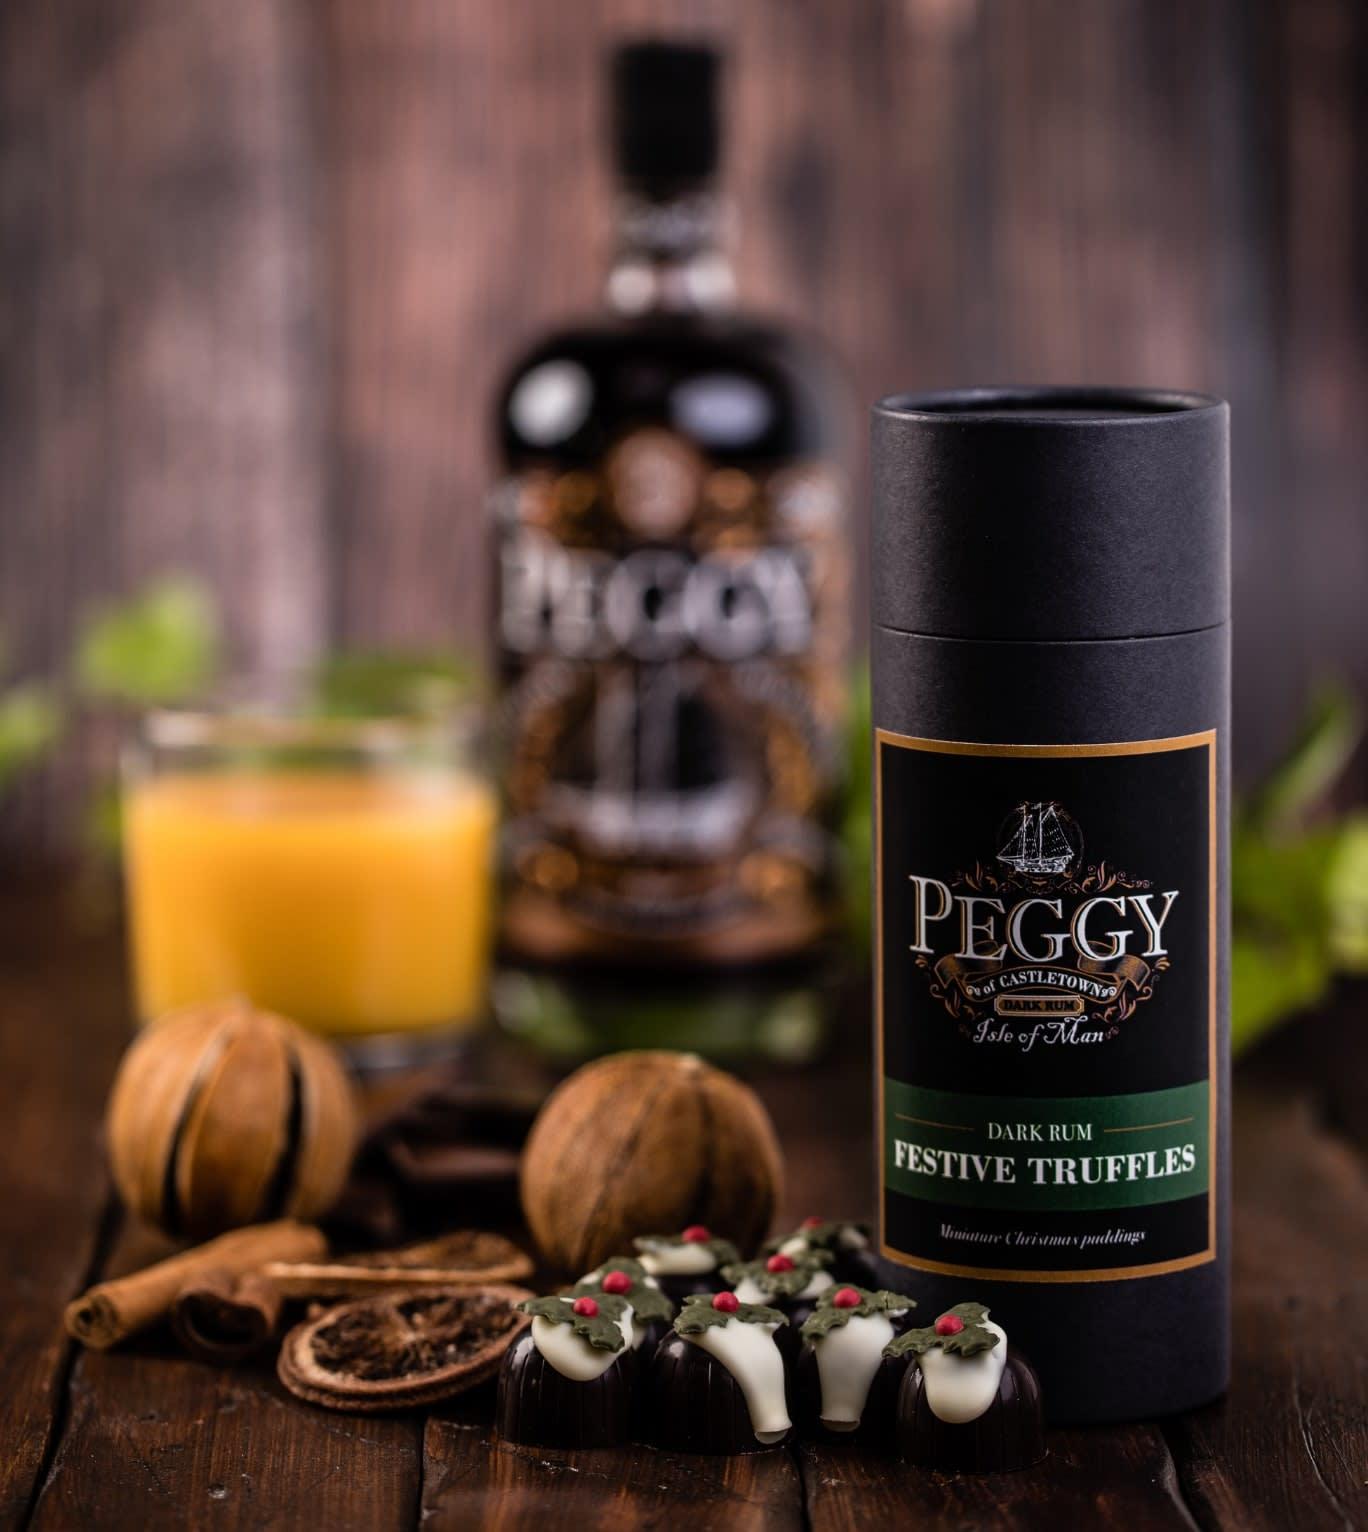 A box of Peggy Dark Rum Festive Truffles on a table